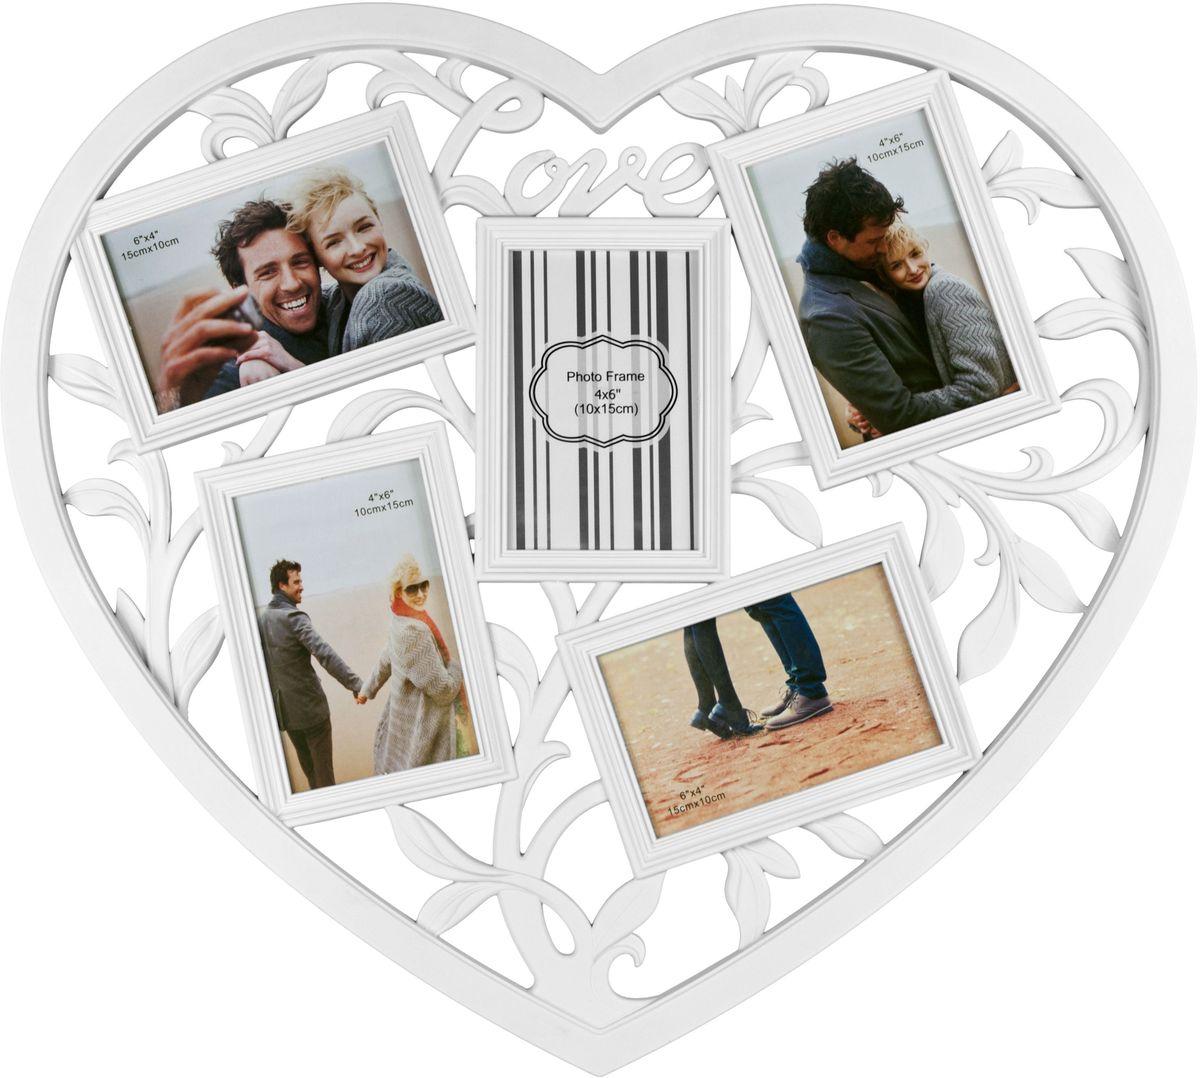 Фоторамка Platinum Сердце, цвет: белый, на 5 фото 10 х 15 см chk 184 фоторамка жемчужное сердце 15 15 1106460